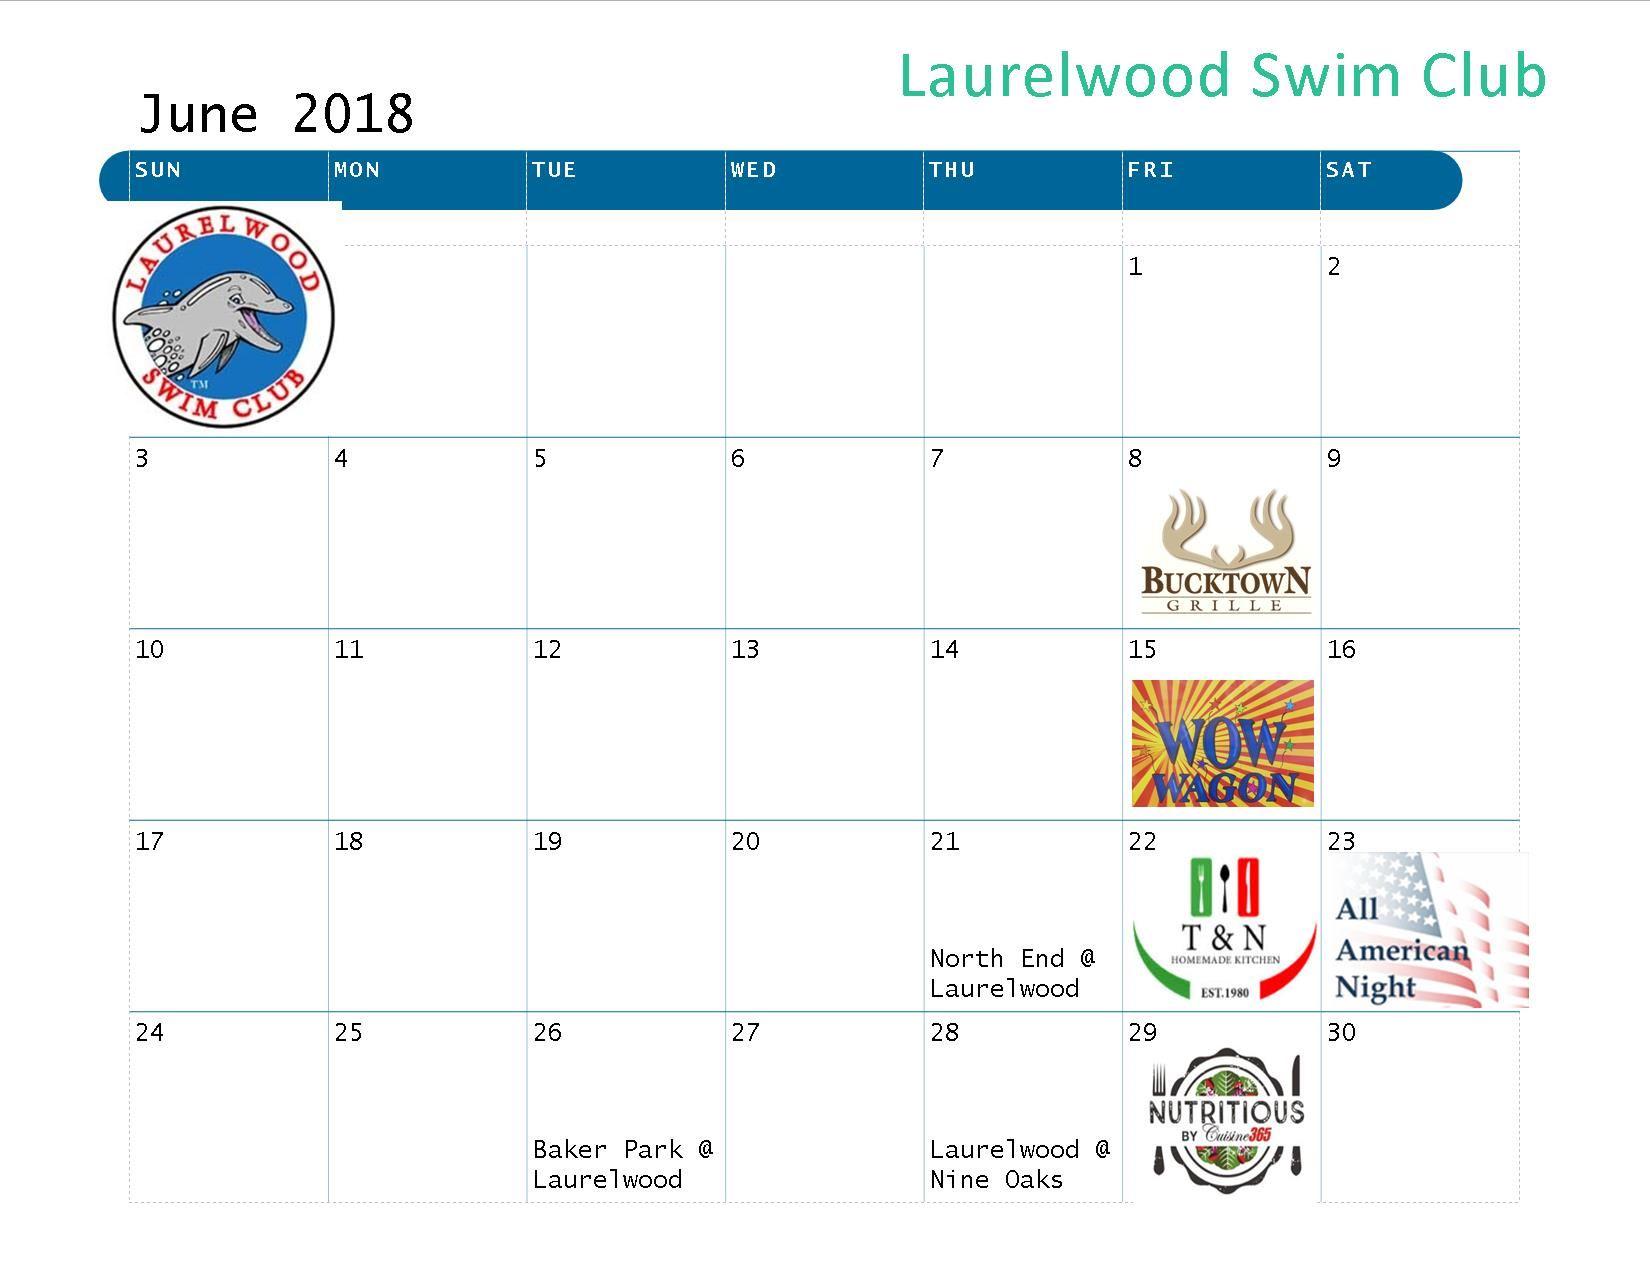 Laurelwood swimclub events for Laurelwood